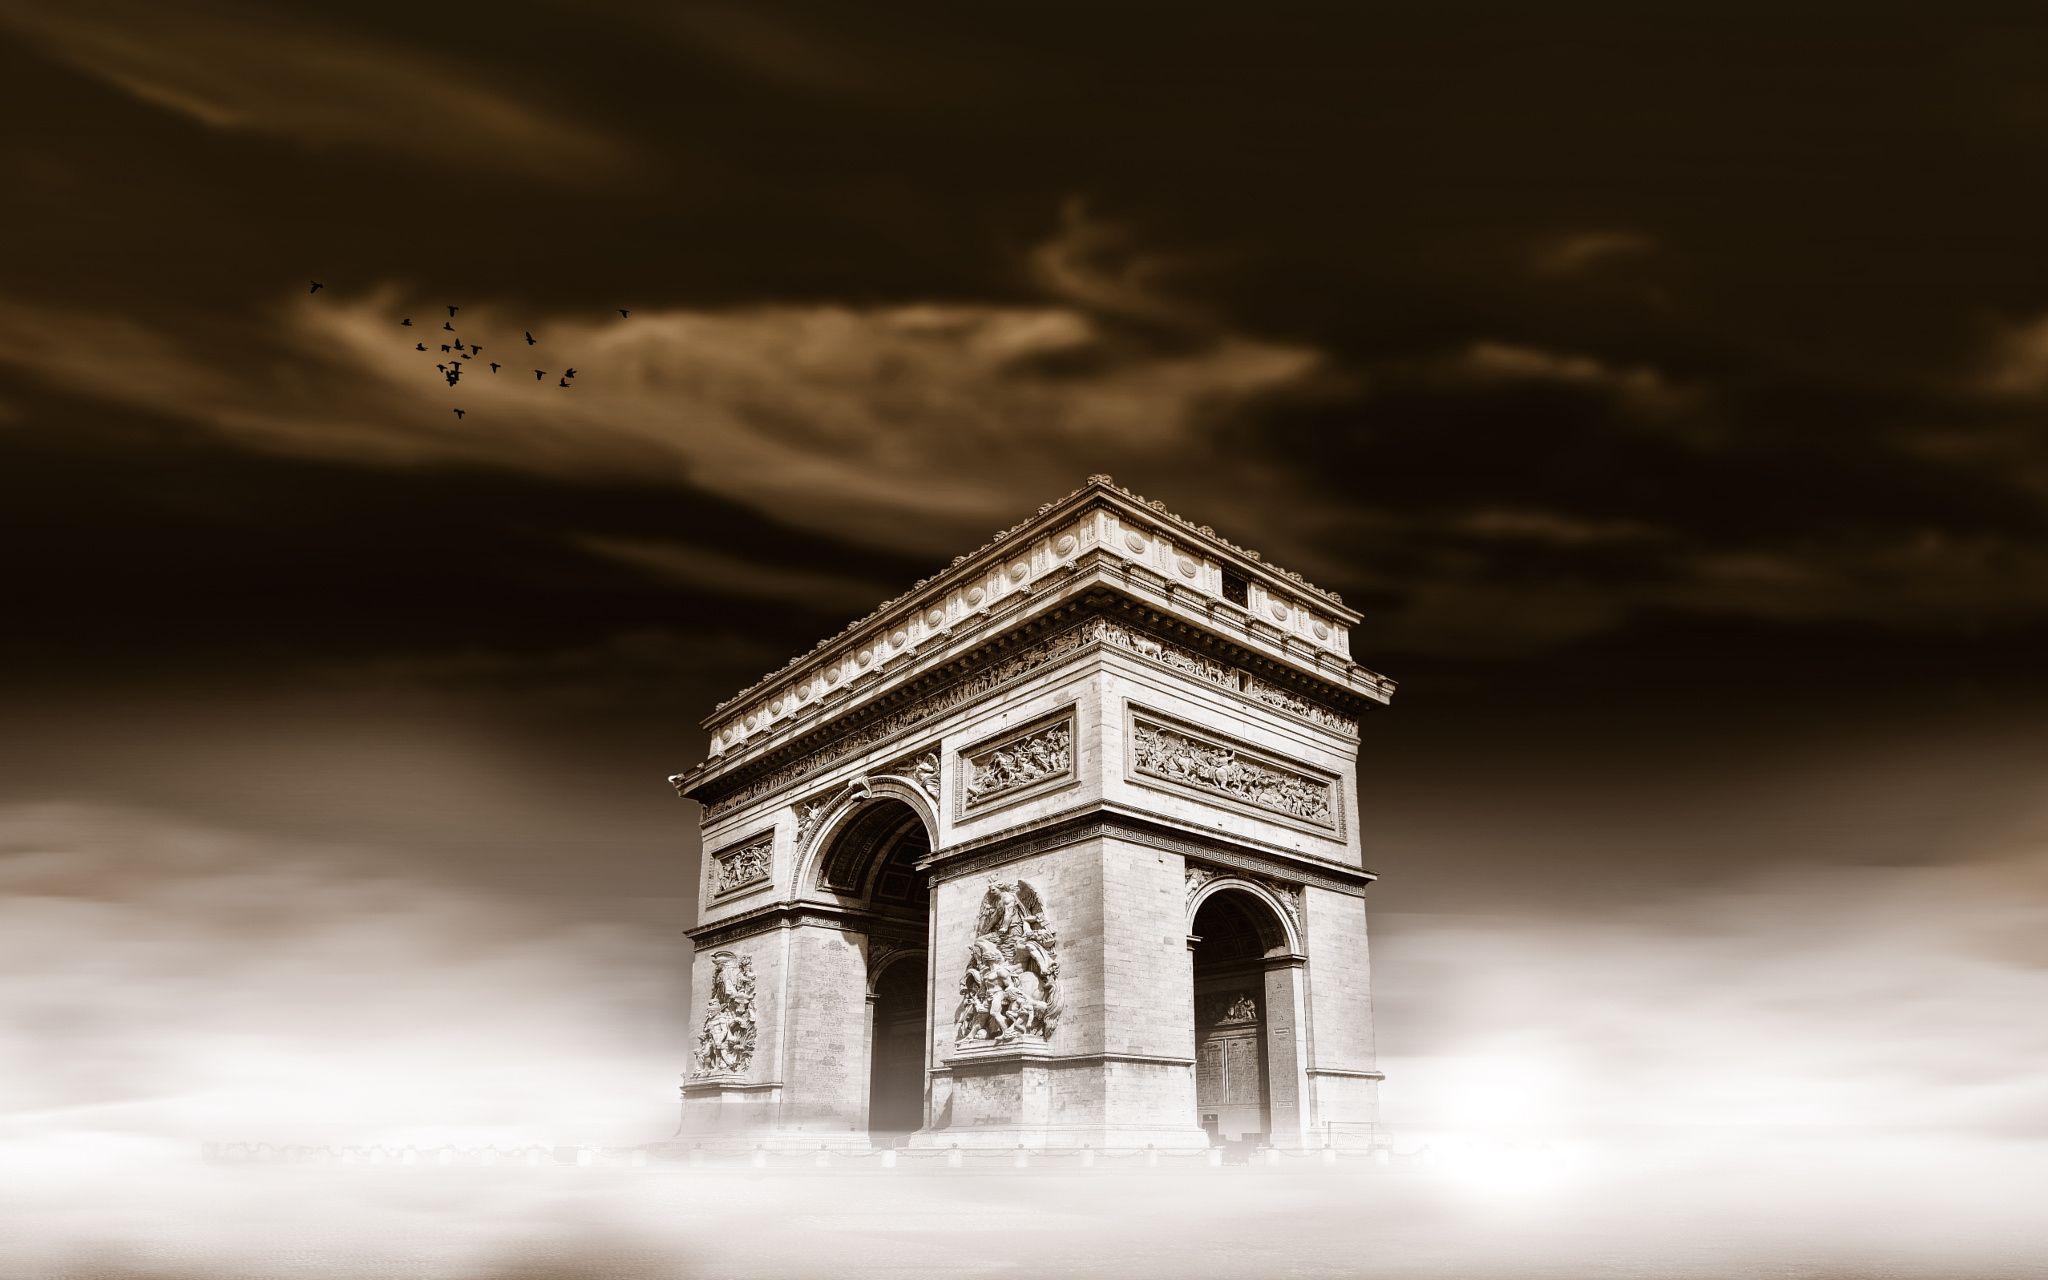 Arc de Triomphe Dream by Mukhtar Al Agha on 500px